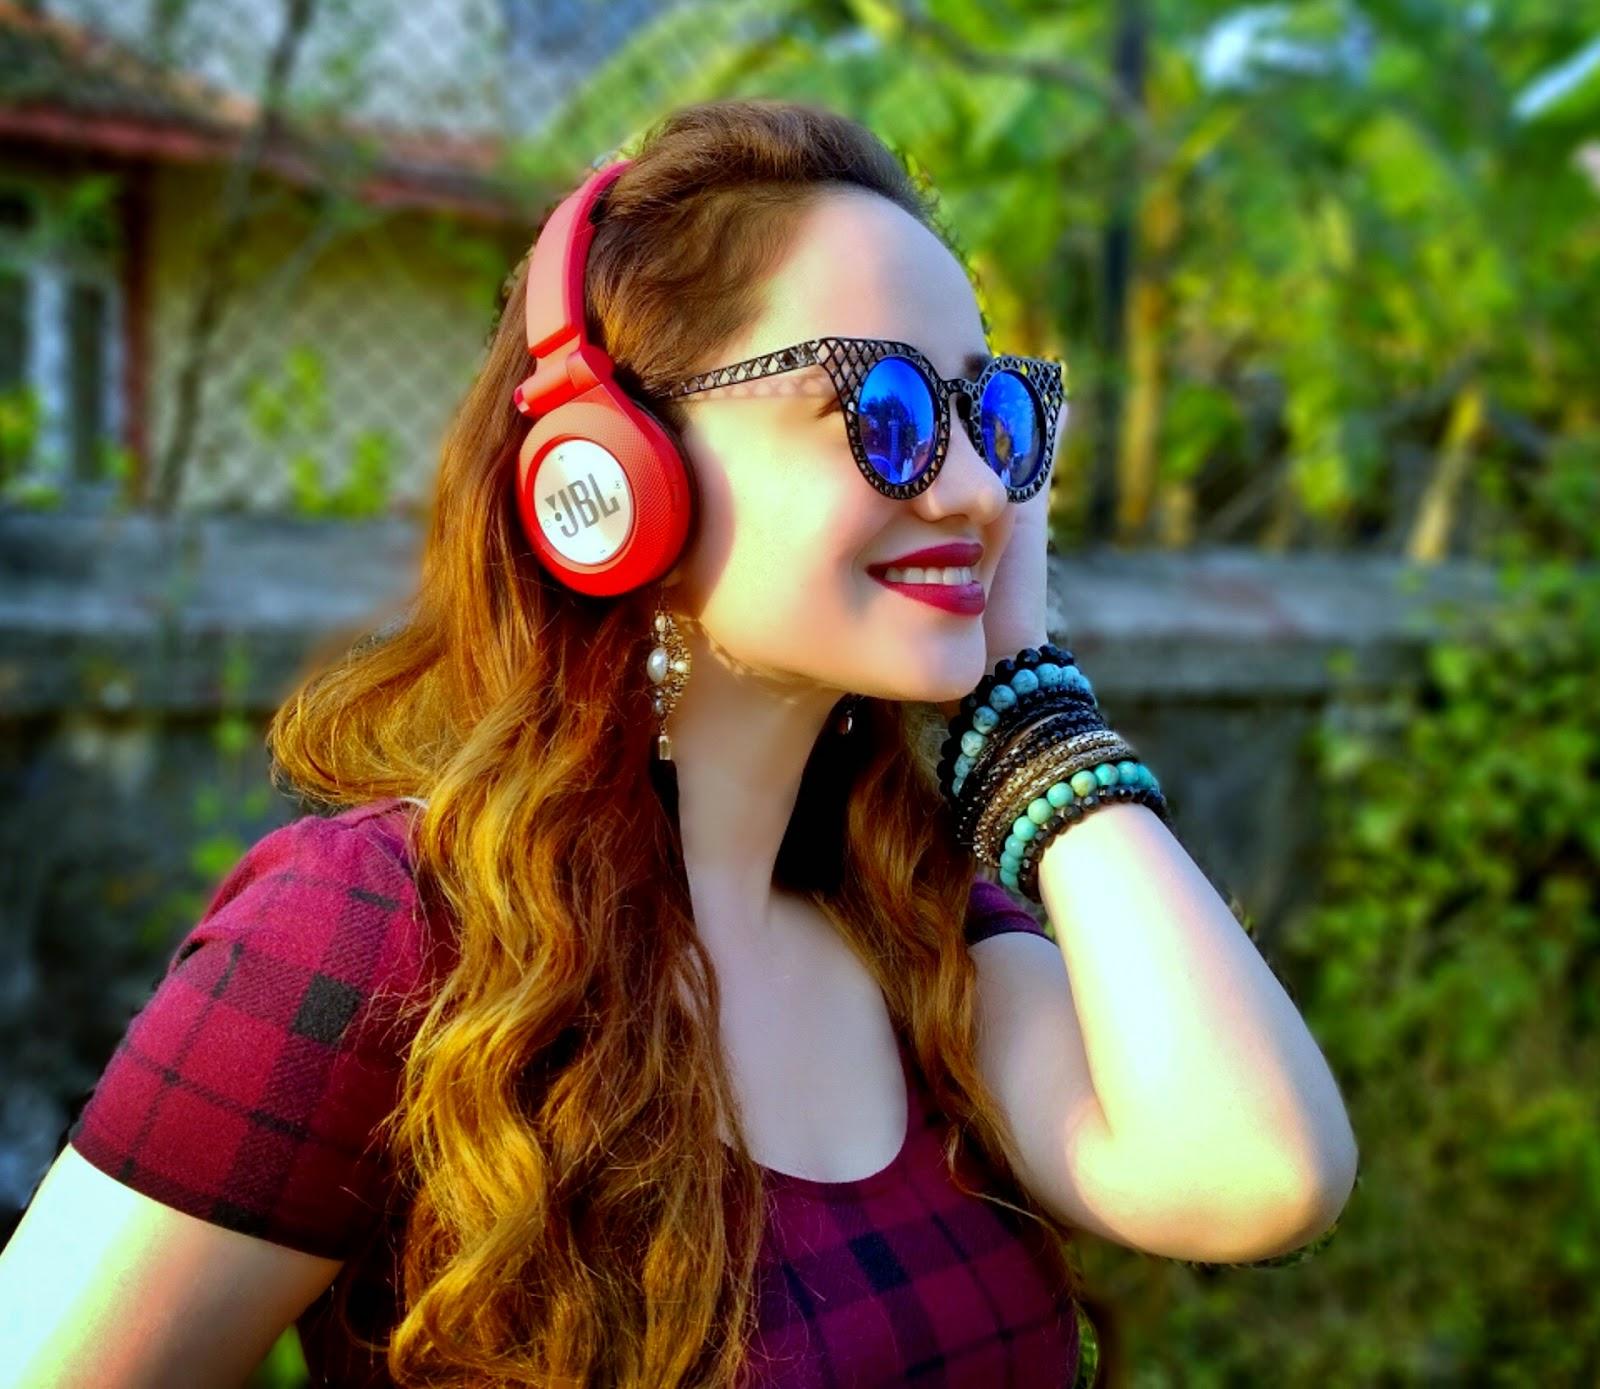 Forever 21 Tartan Plaid Crop Top,JBL Synchros Headphones